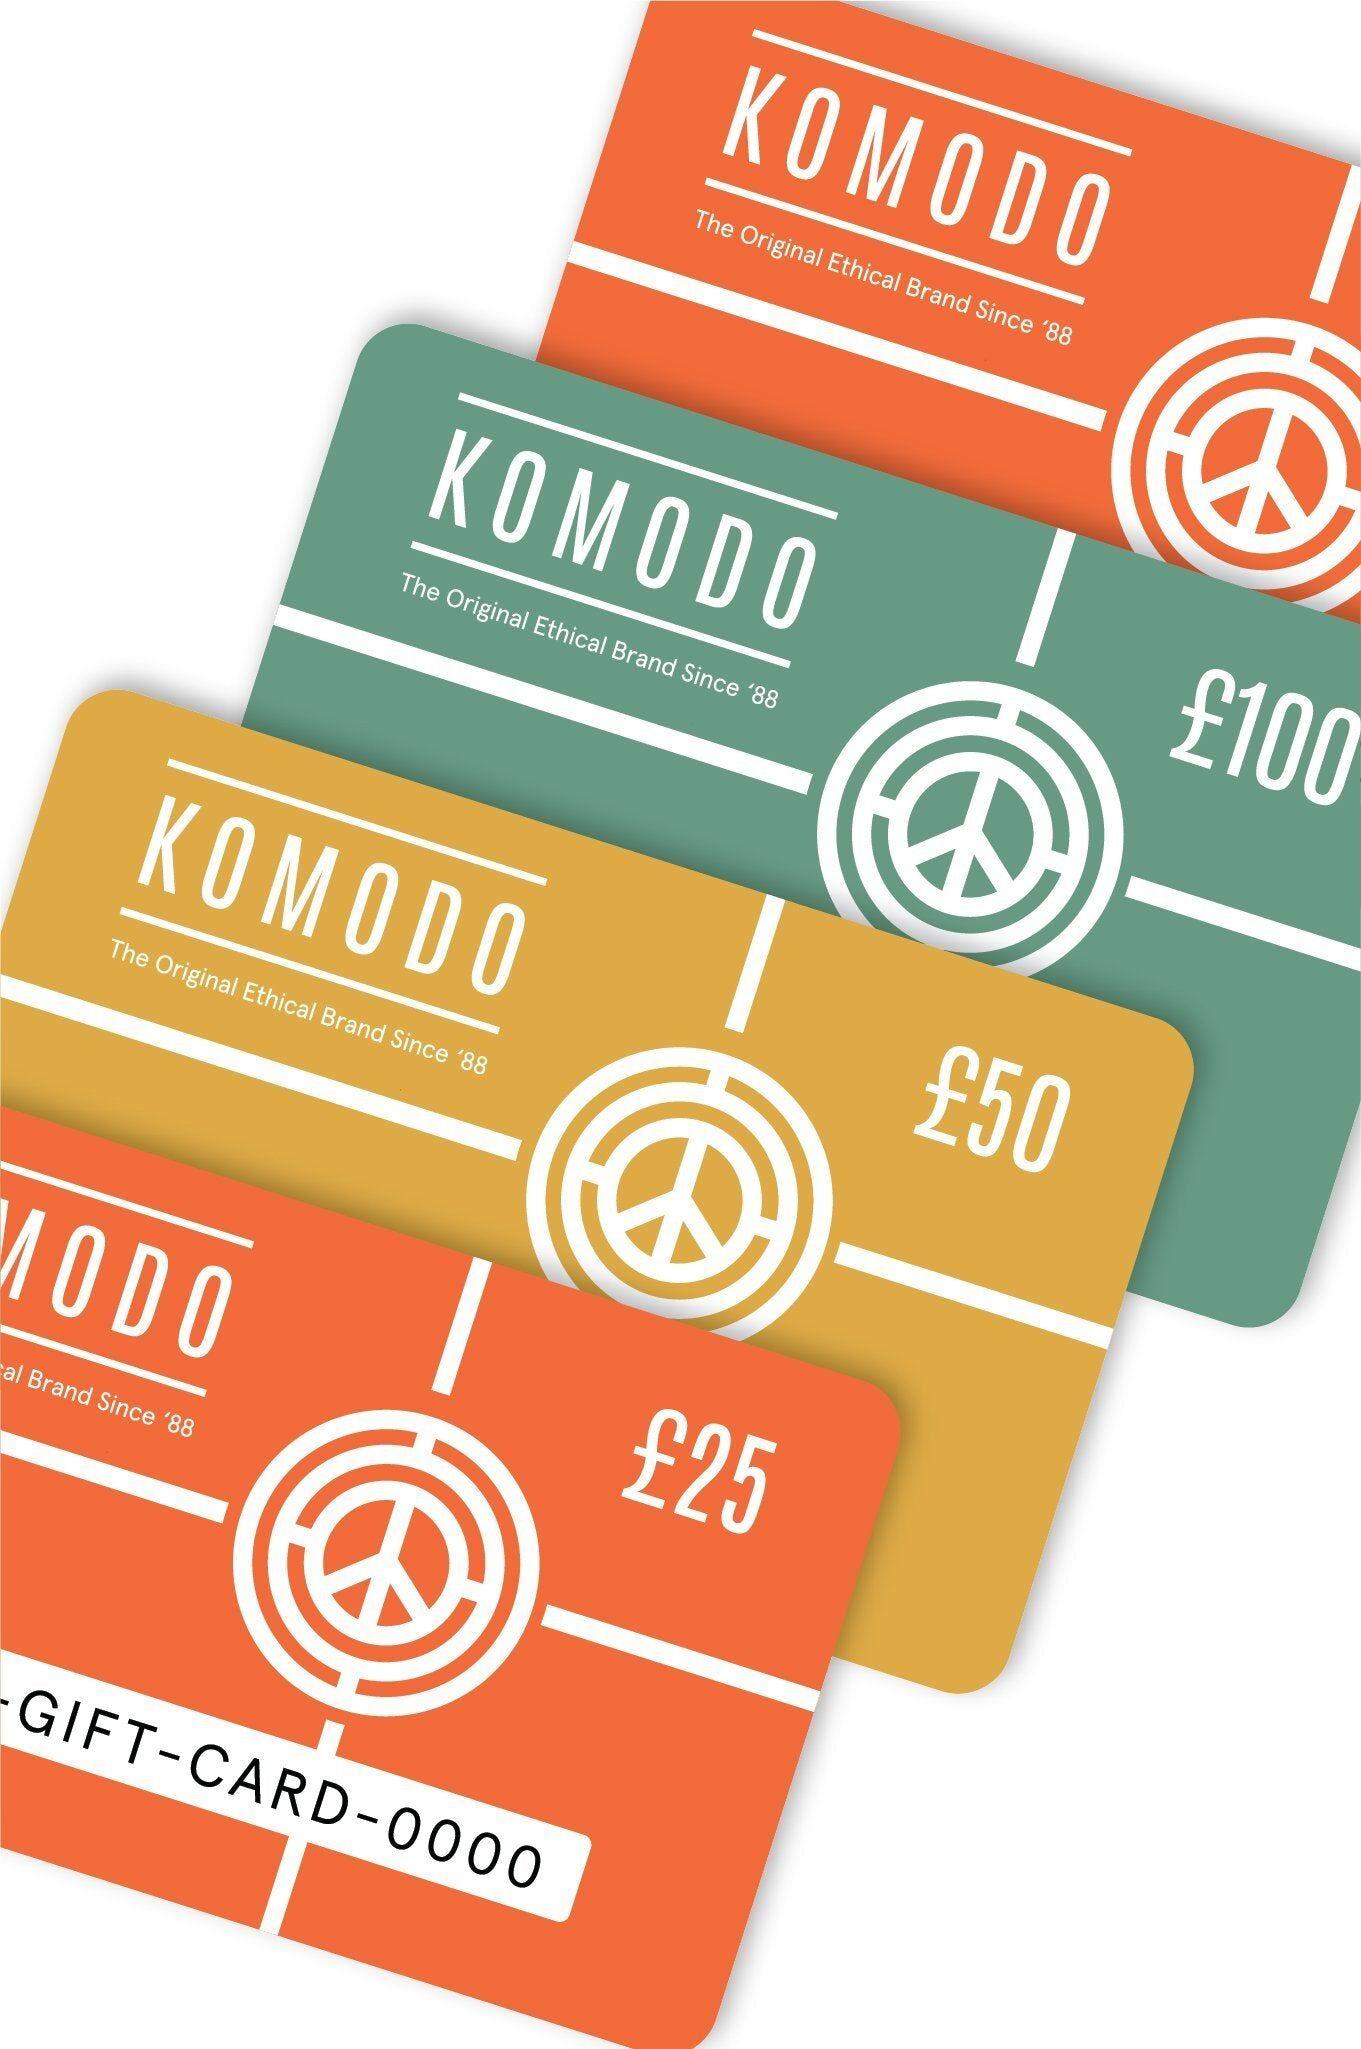 Komodo Gift Cards, £200.00